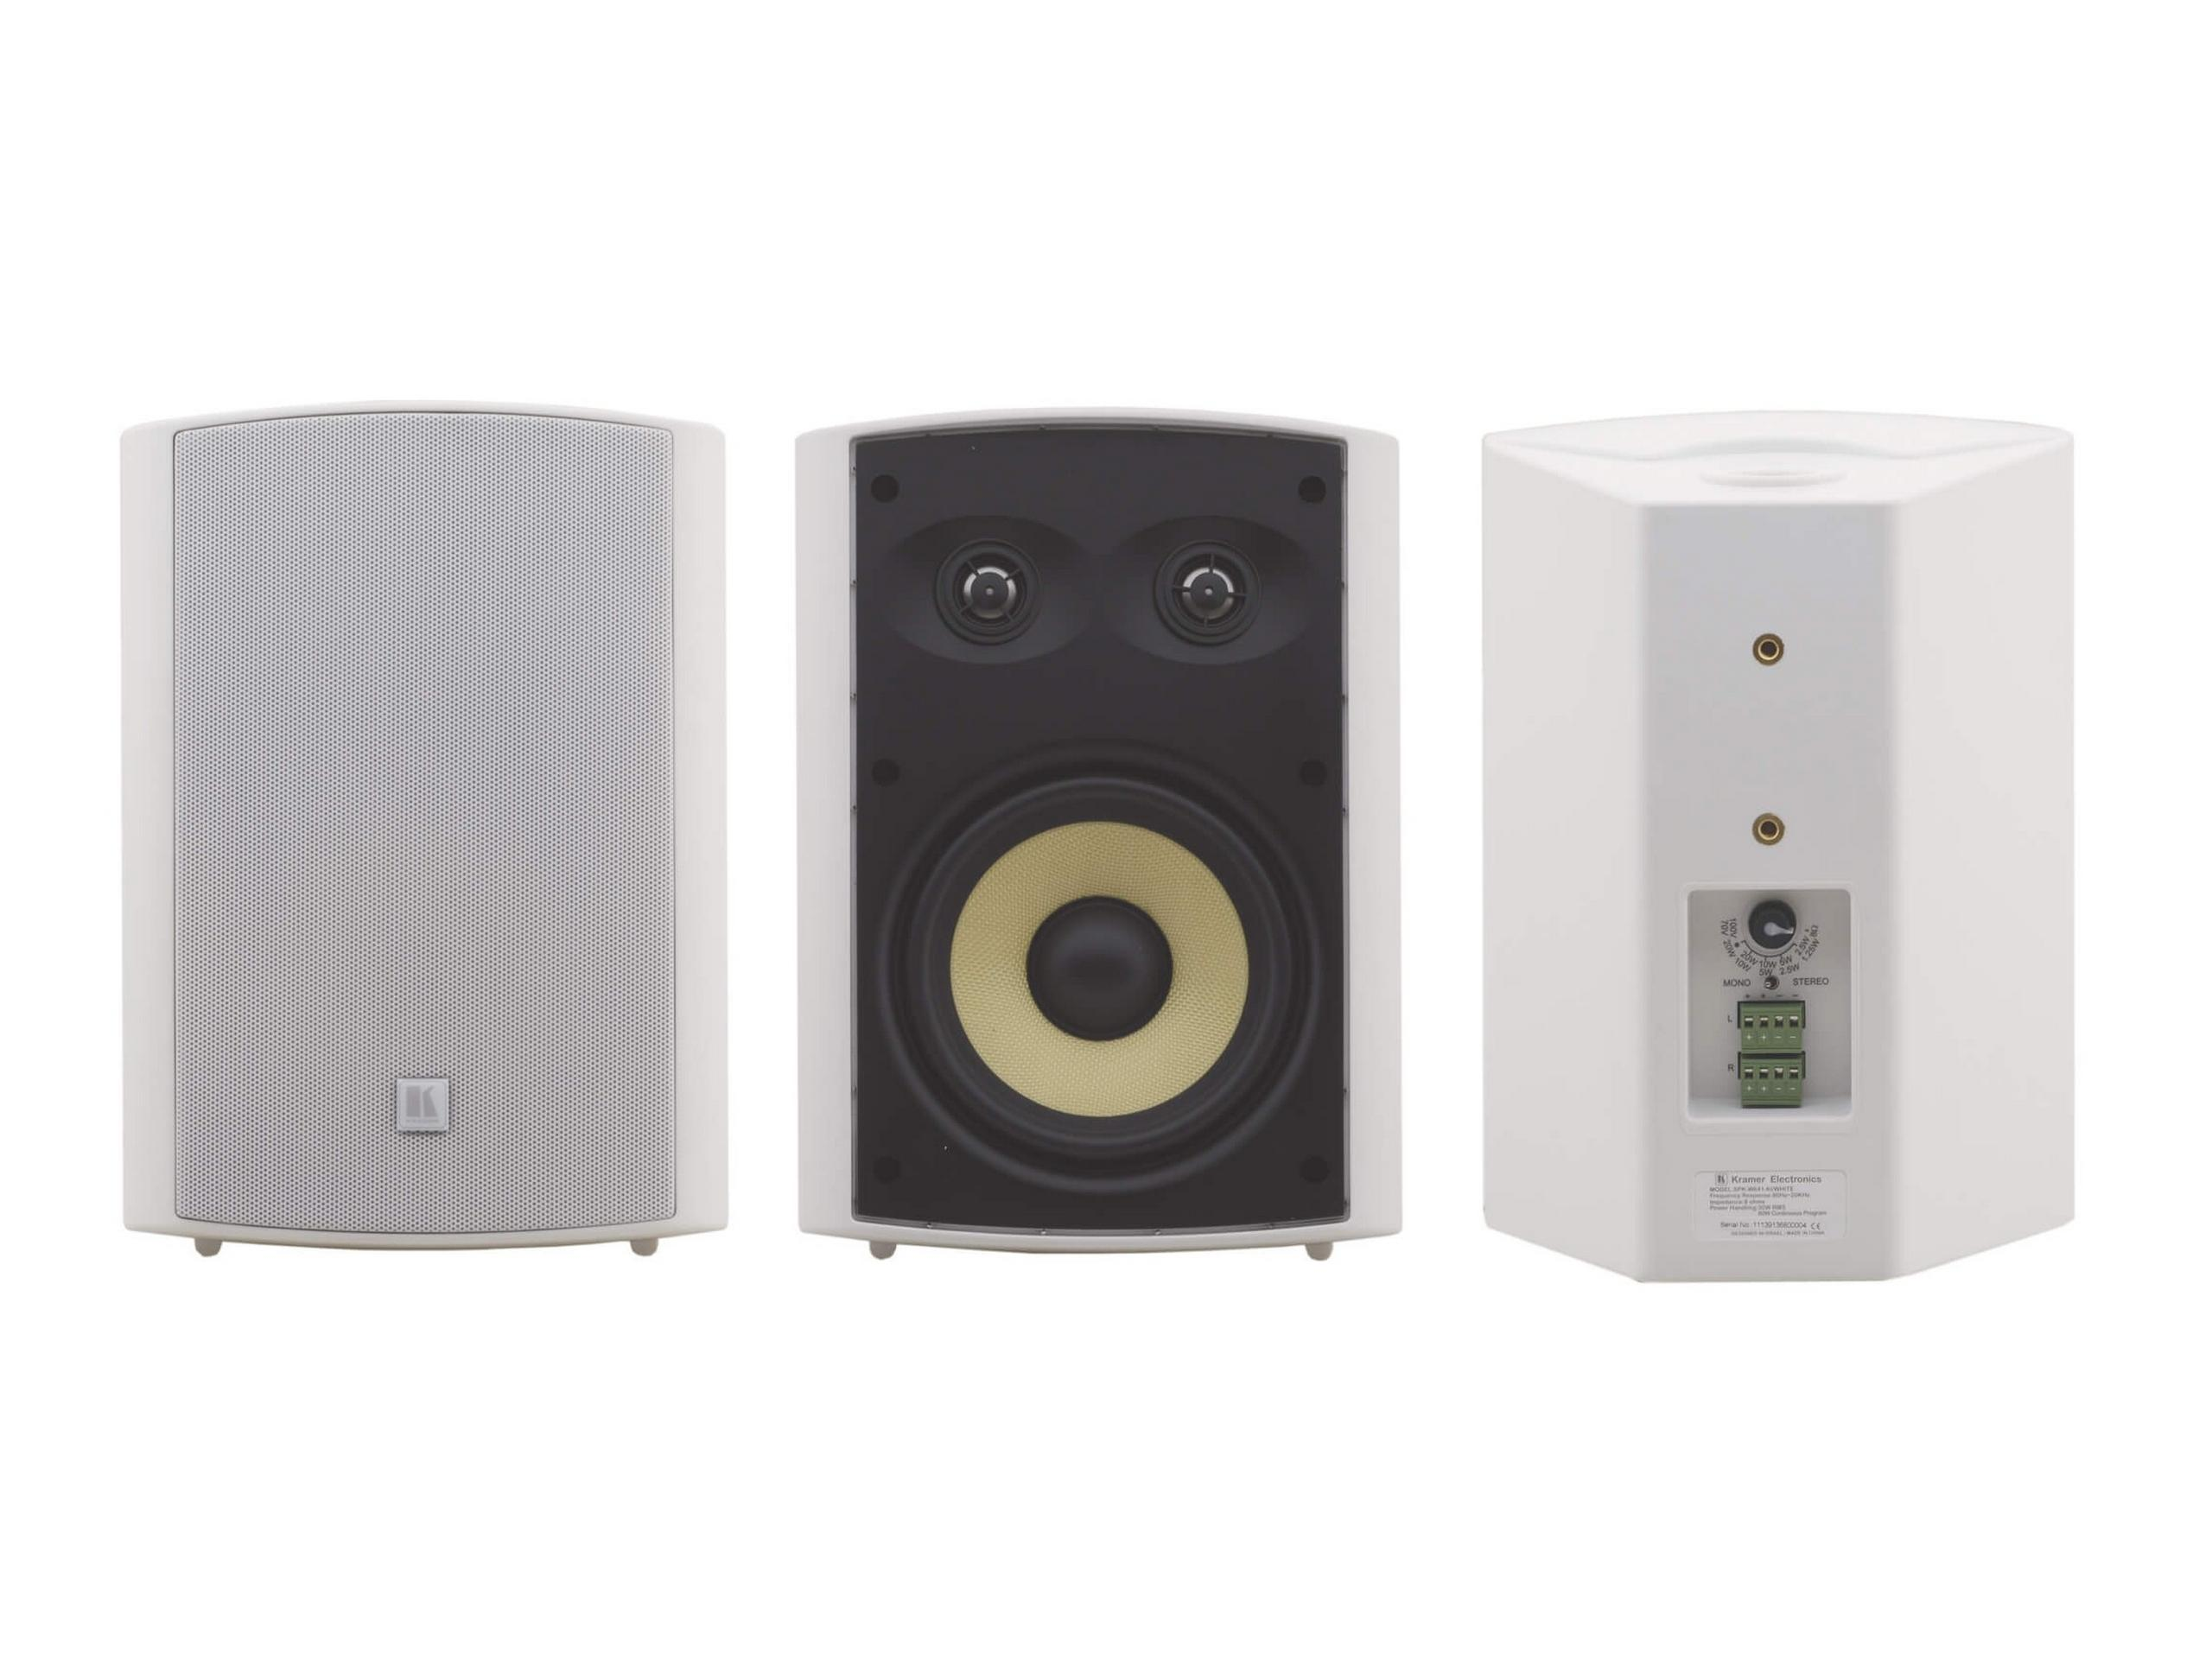 YARDEN 6-OD(W) 6.5 inch Wall Speaker/made with Kevlar Woofer 2x1 Titanium Tweeters/White by Kramer